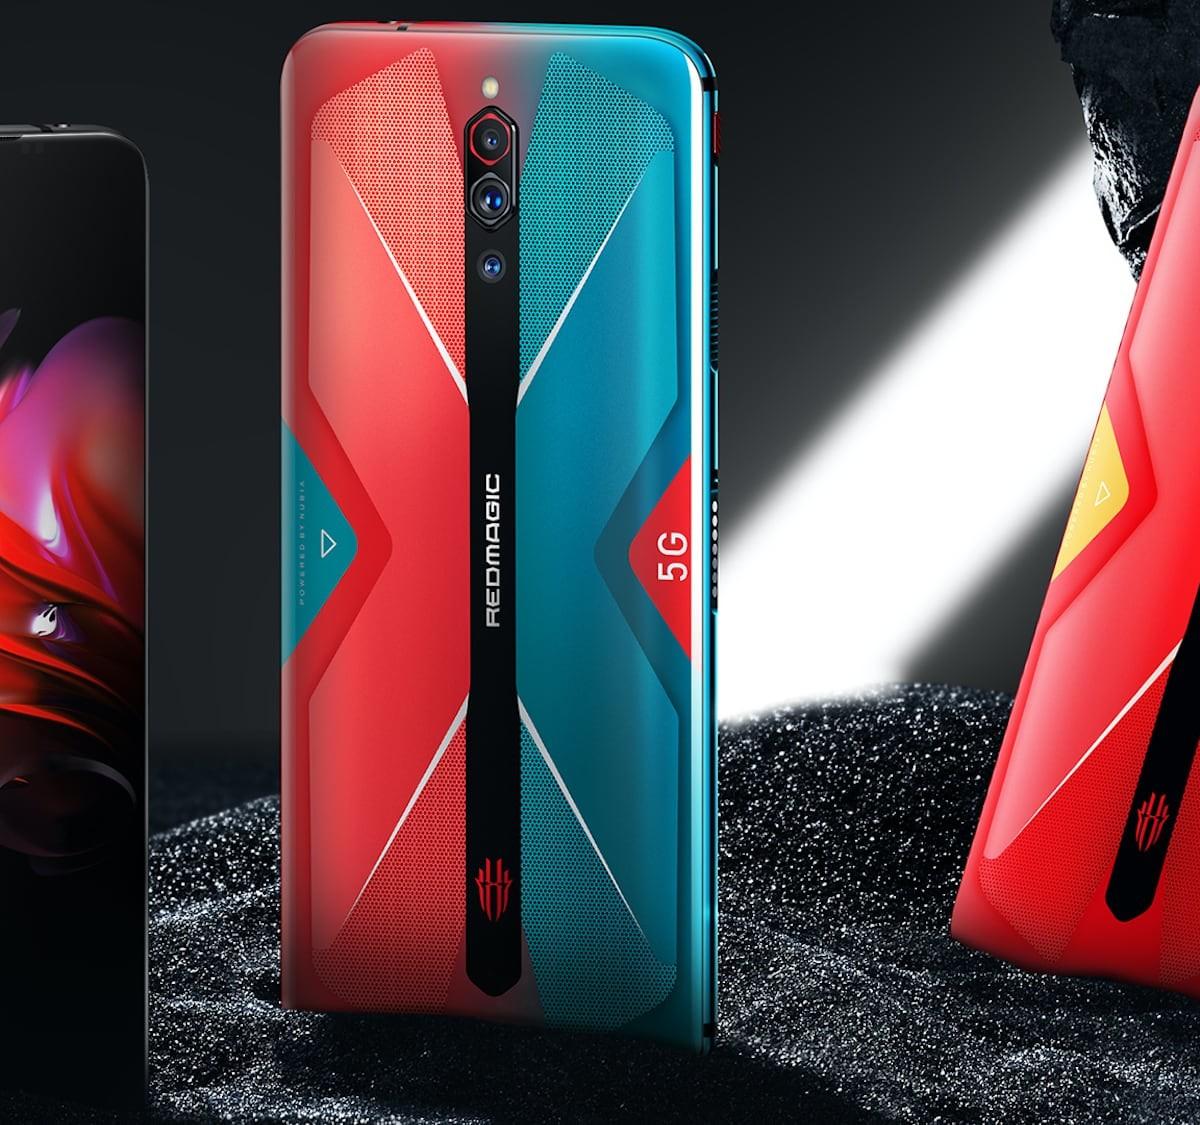 RedMagic 5G Triple Camera Gaming Smartphone has a super fast 144Hz refresh rate